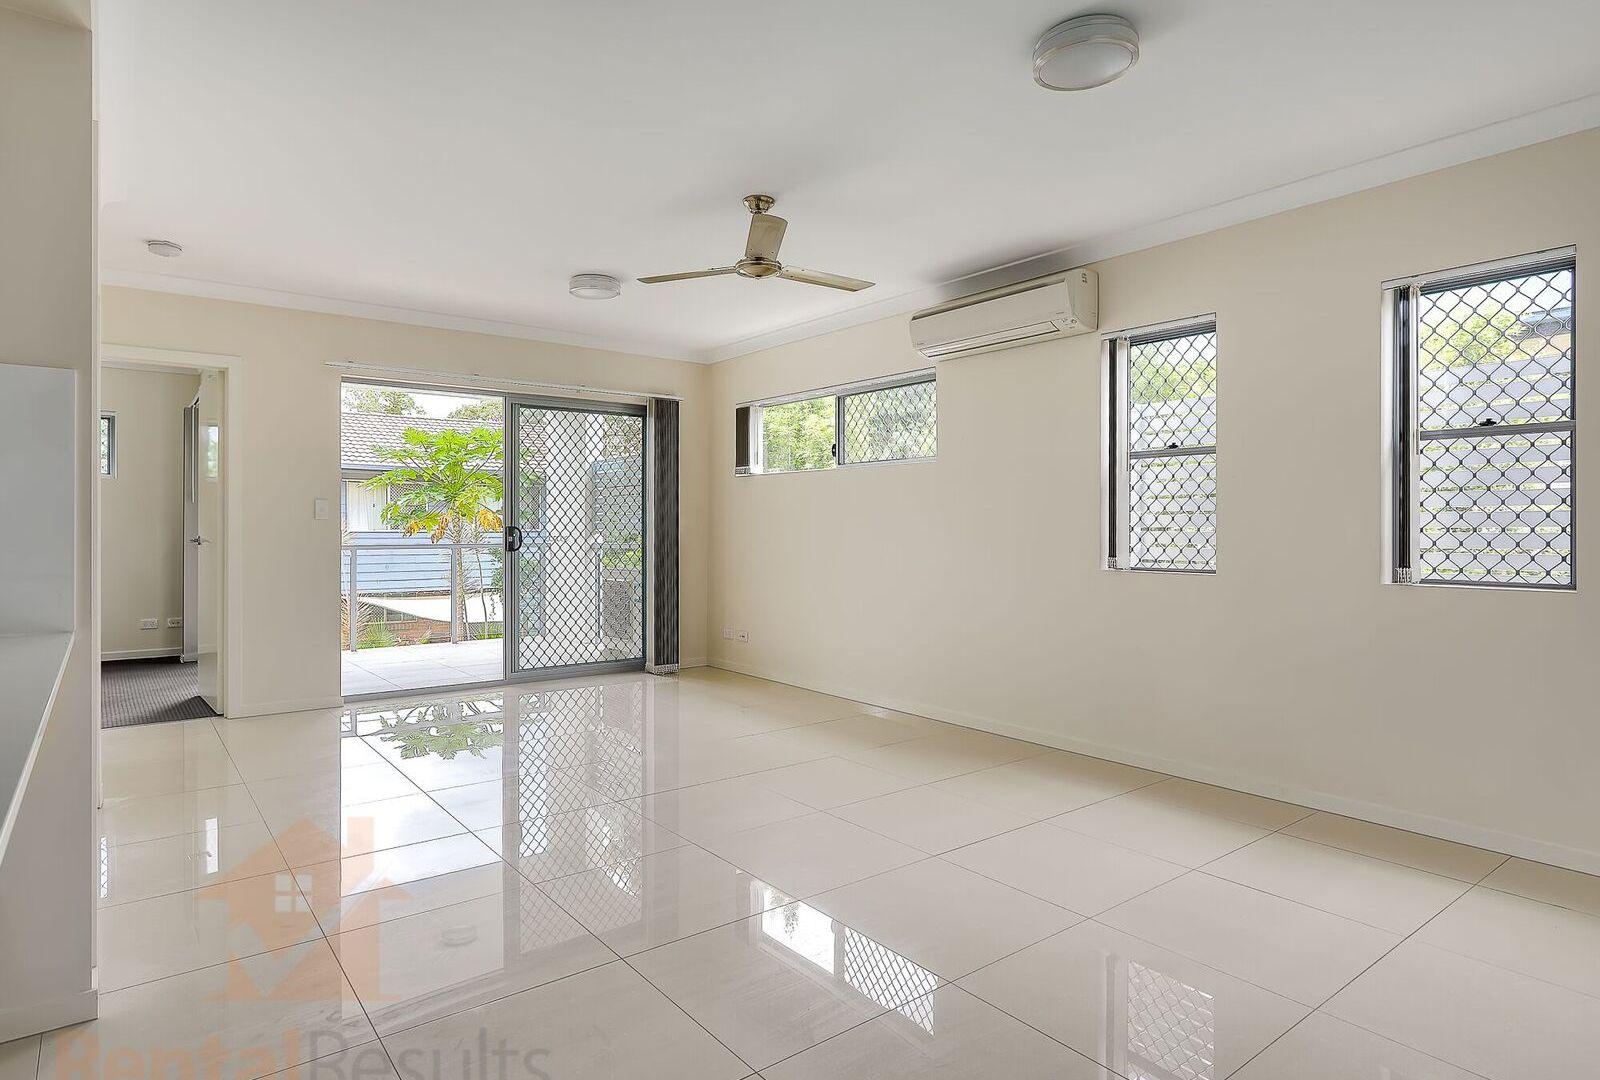 7/52 Gaythorne Road, Gaythorne QLD 4051, Image 2